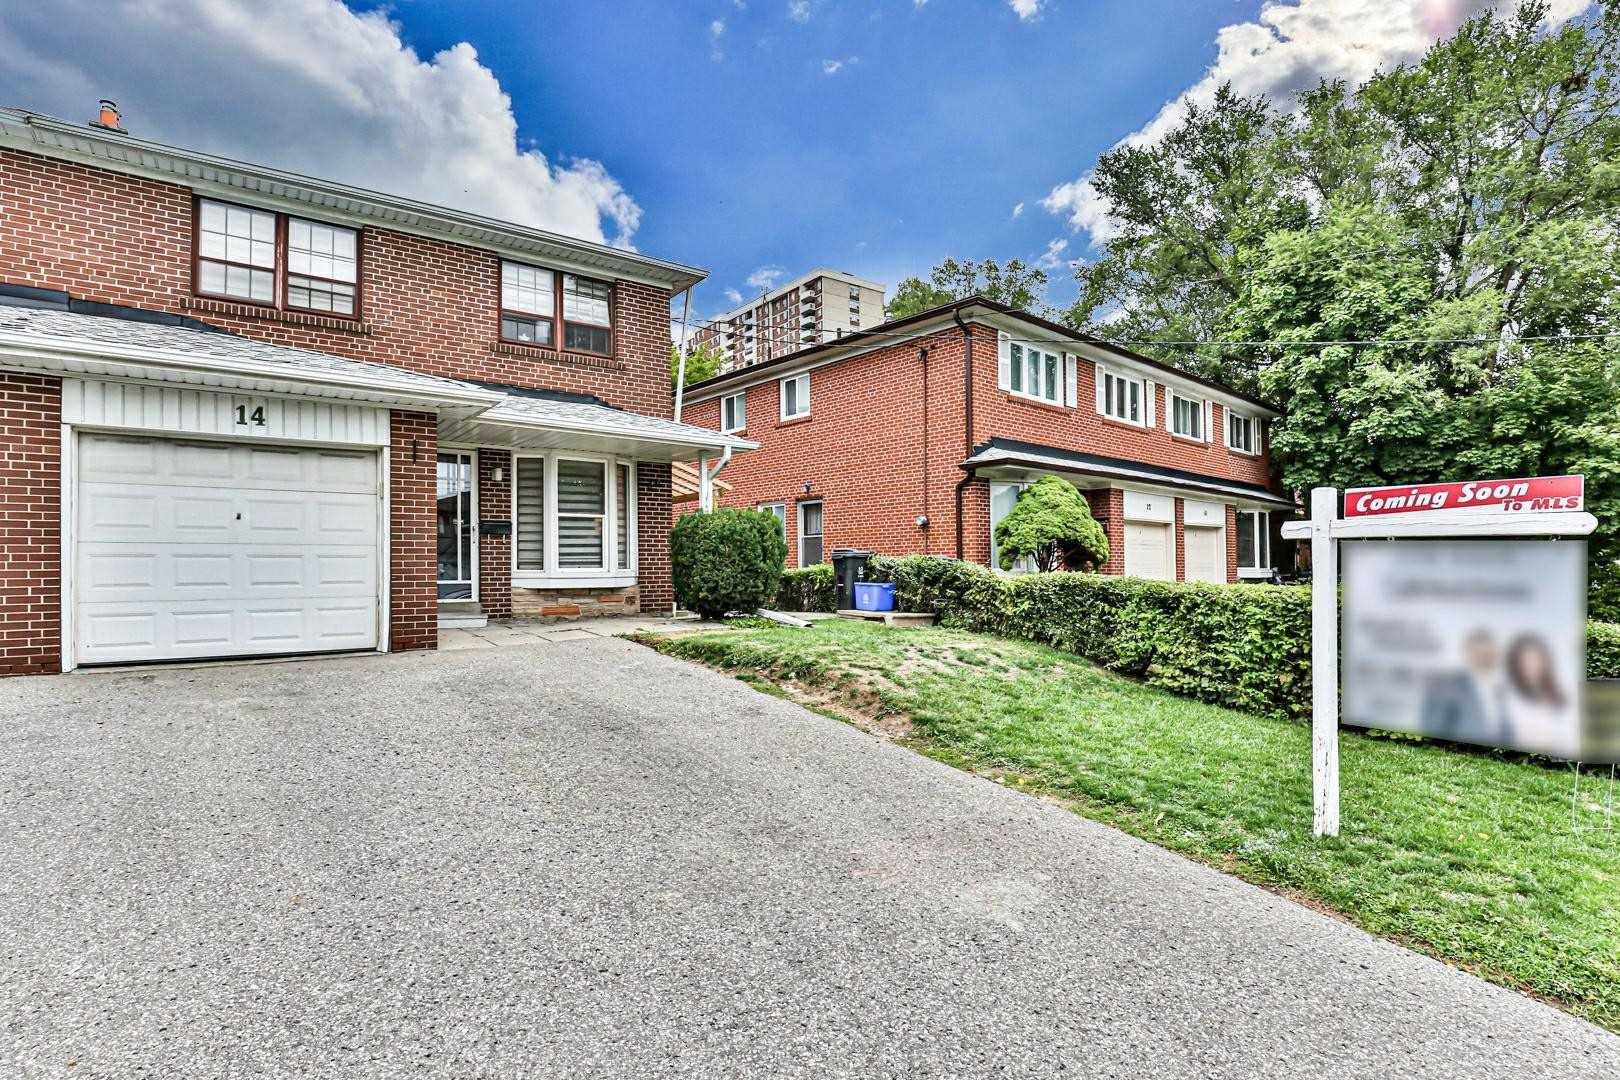 Main Photo: 14 Fontainbleau Drive in Toronto: Newtonbrook West House (2-Storey) for sale (Toronto C07)  : MLS®# C4906491